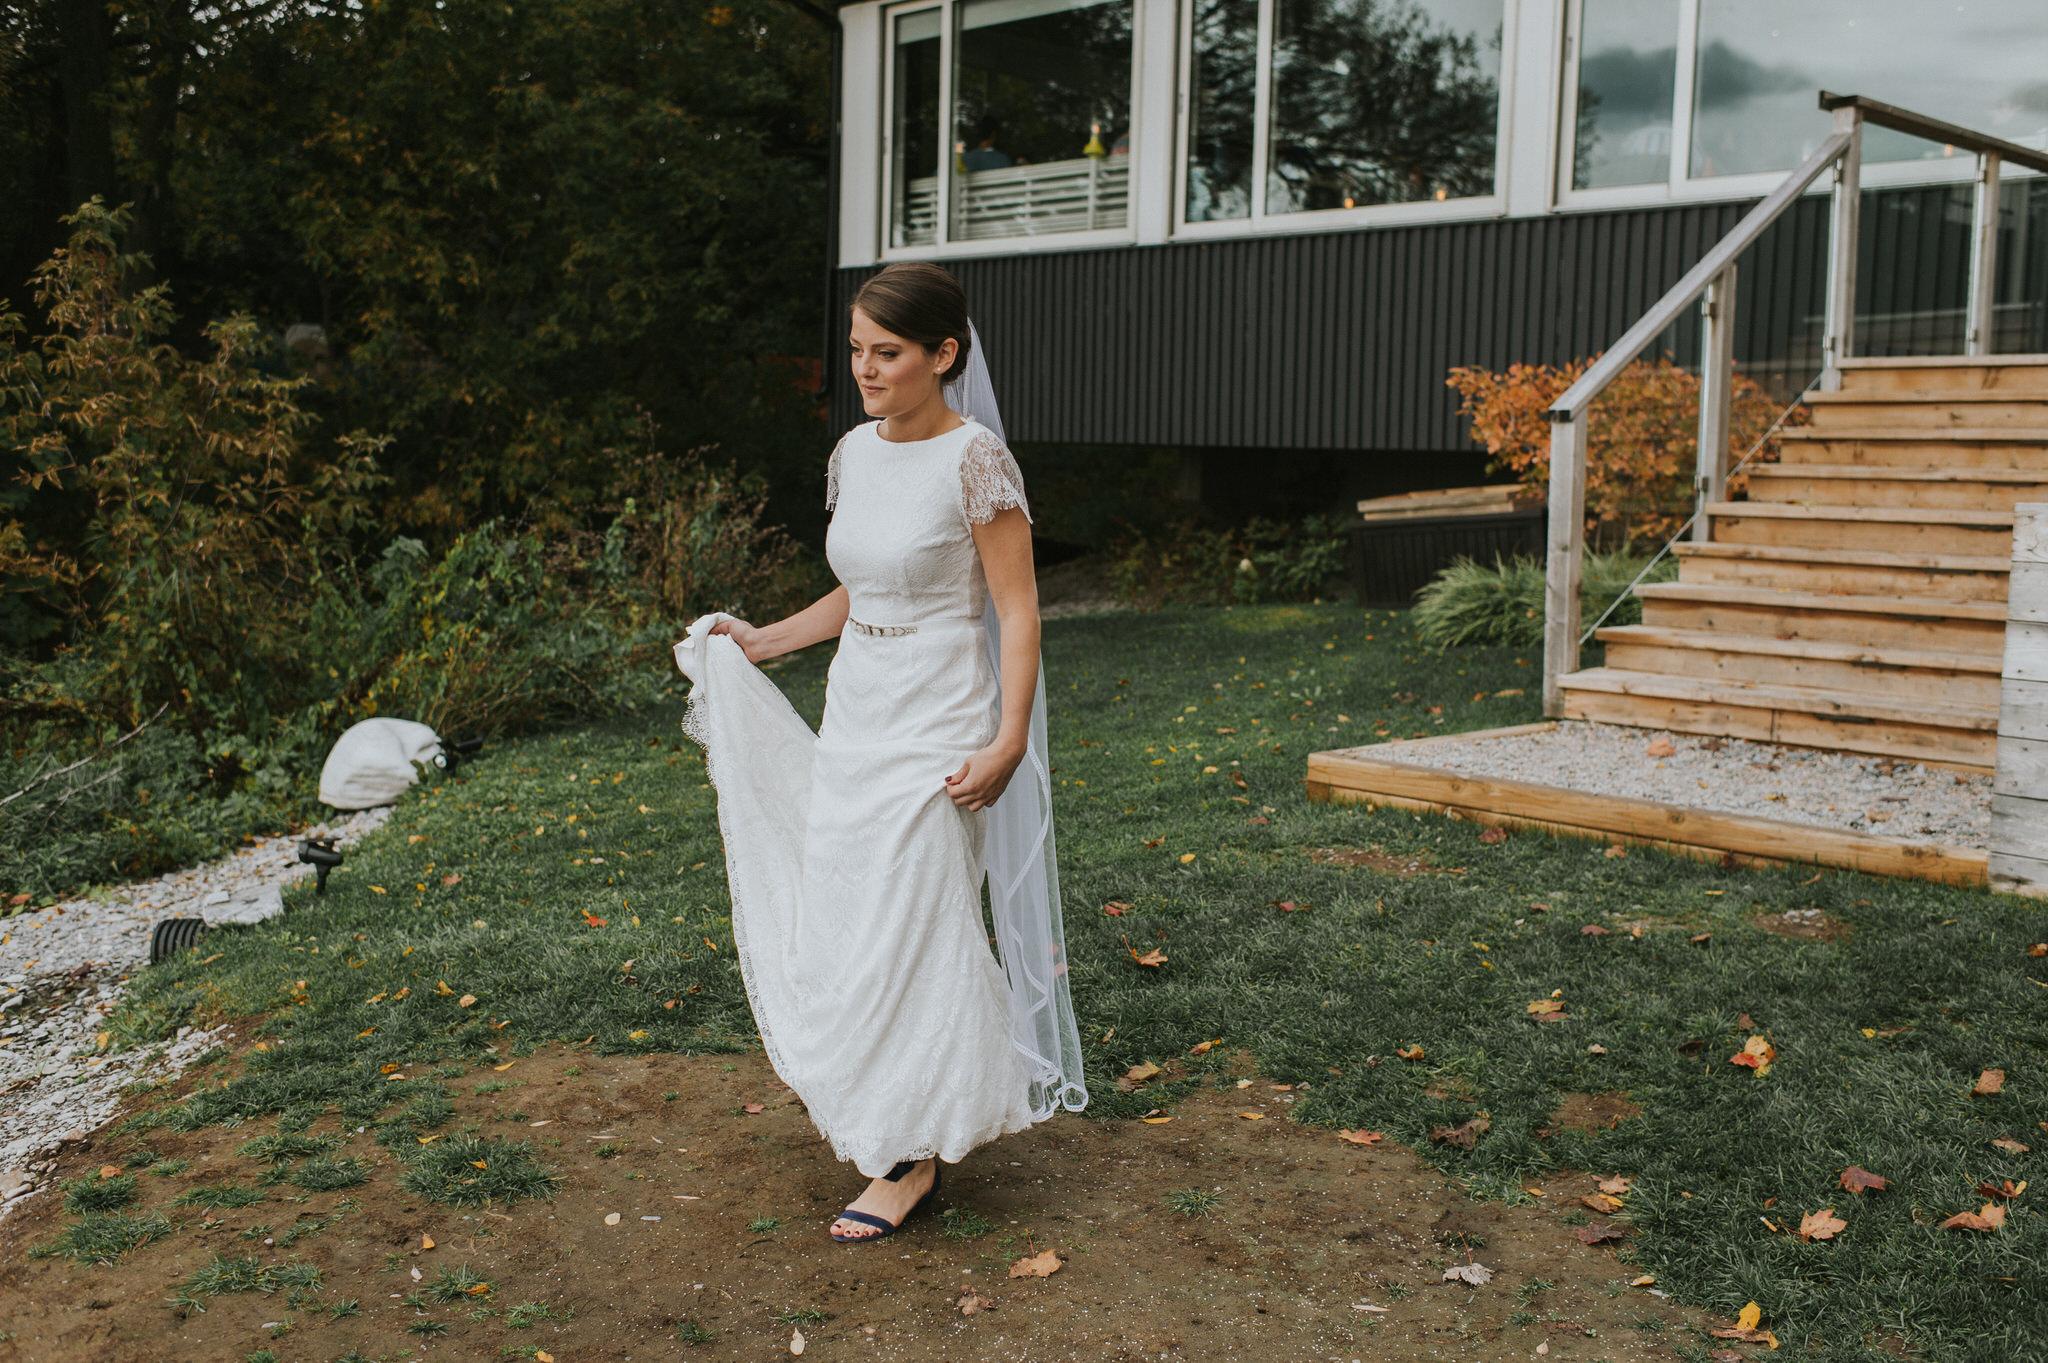 scarletoneillphotography_weddingphotography_prince edward county weddings032.JPG